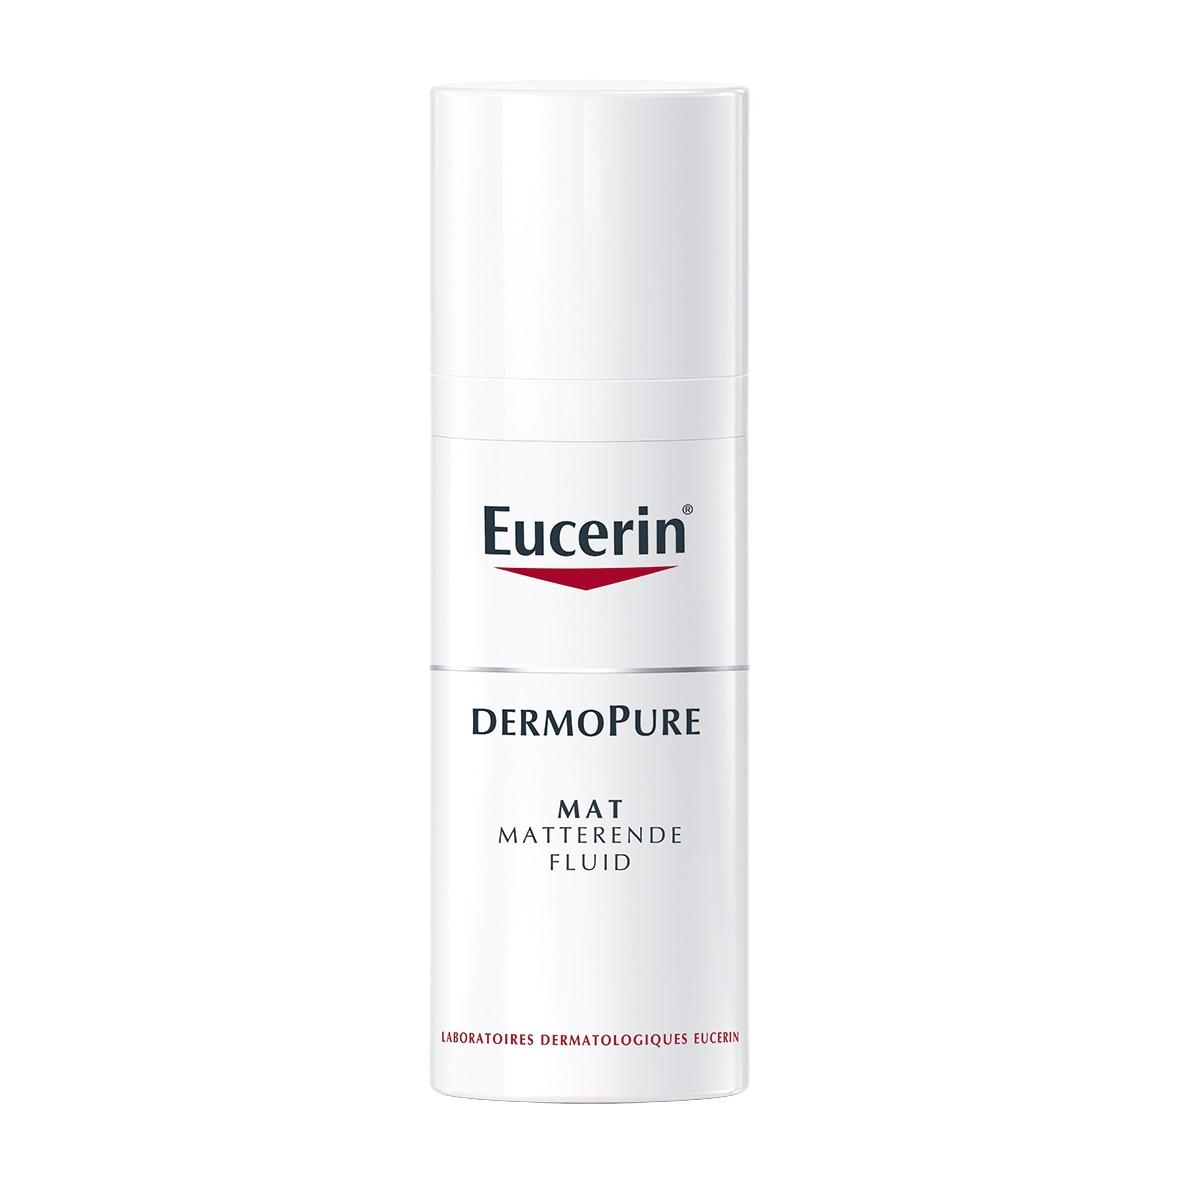 Eucerin DermoPure Matterende fluid